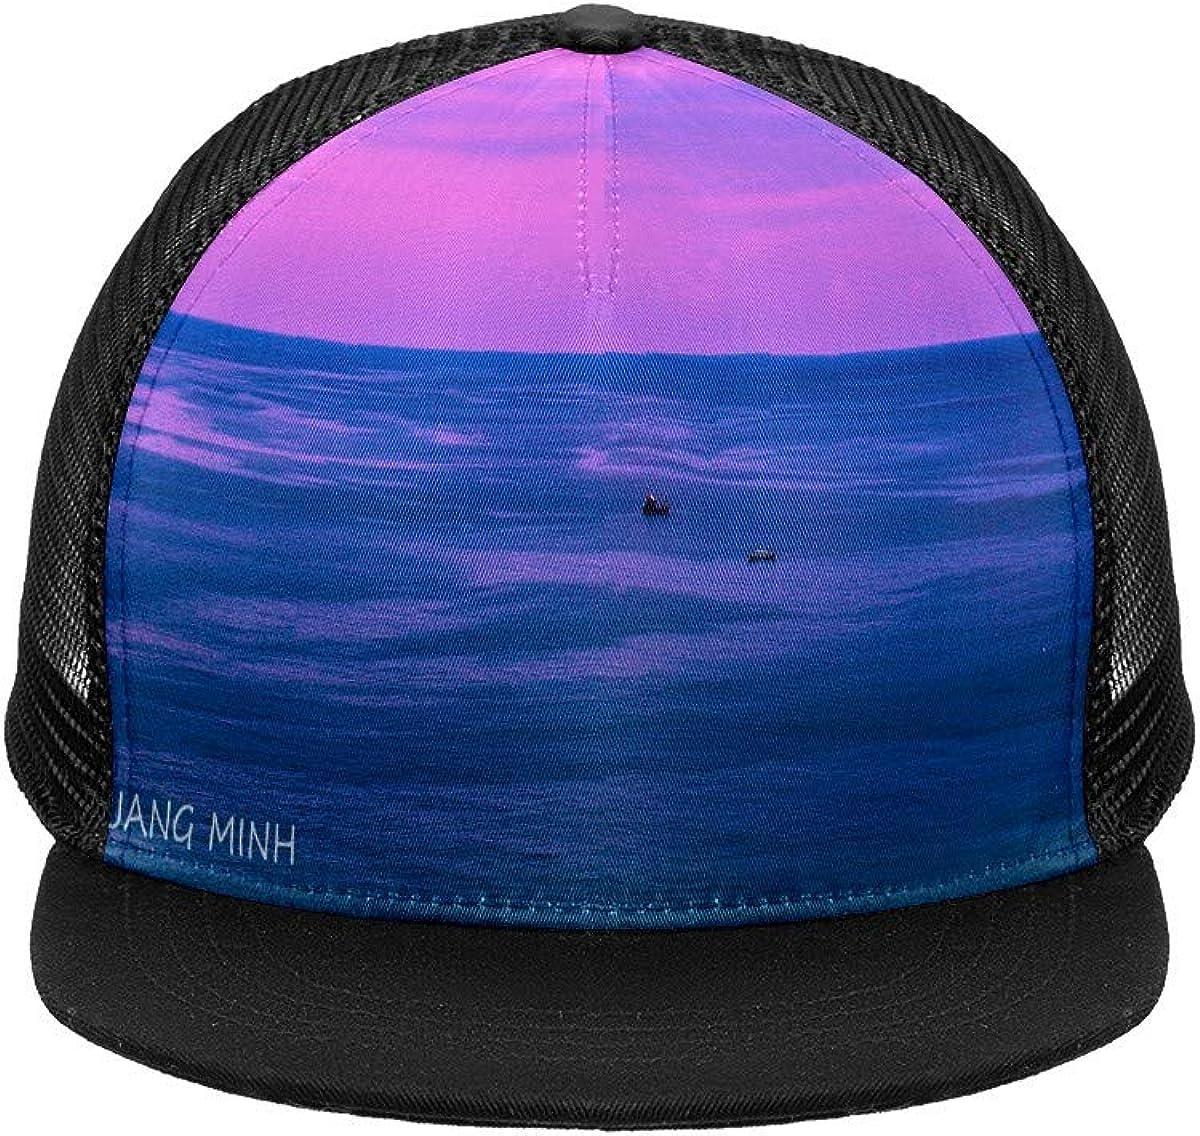 Beautiful Scene Mesh Baseball Cap Black Trucker Hat for Men Women Summer Headgear Adjustable Mens Snap Backs Sun Hats Hip Hop Flat Brim Brimmed caps Sports Outdoors One Size Fits All